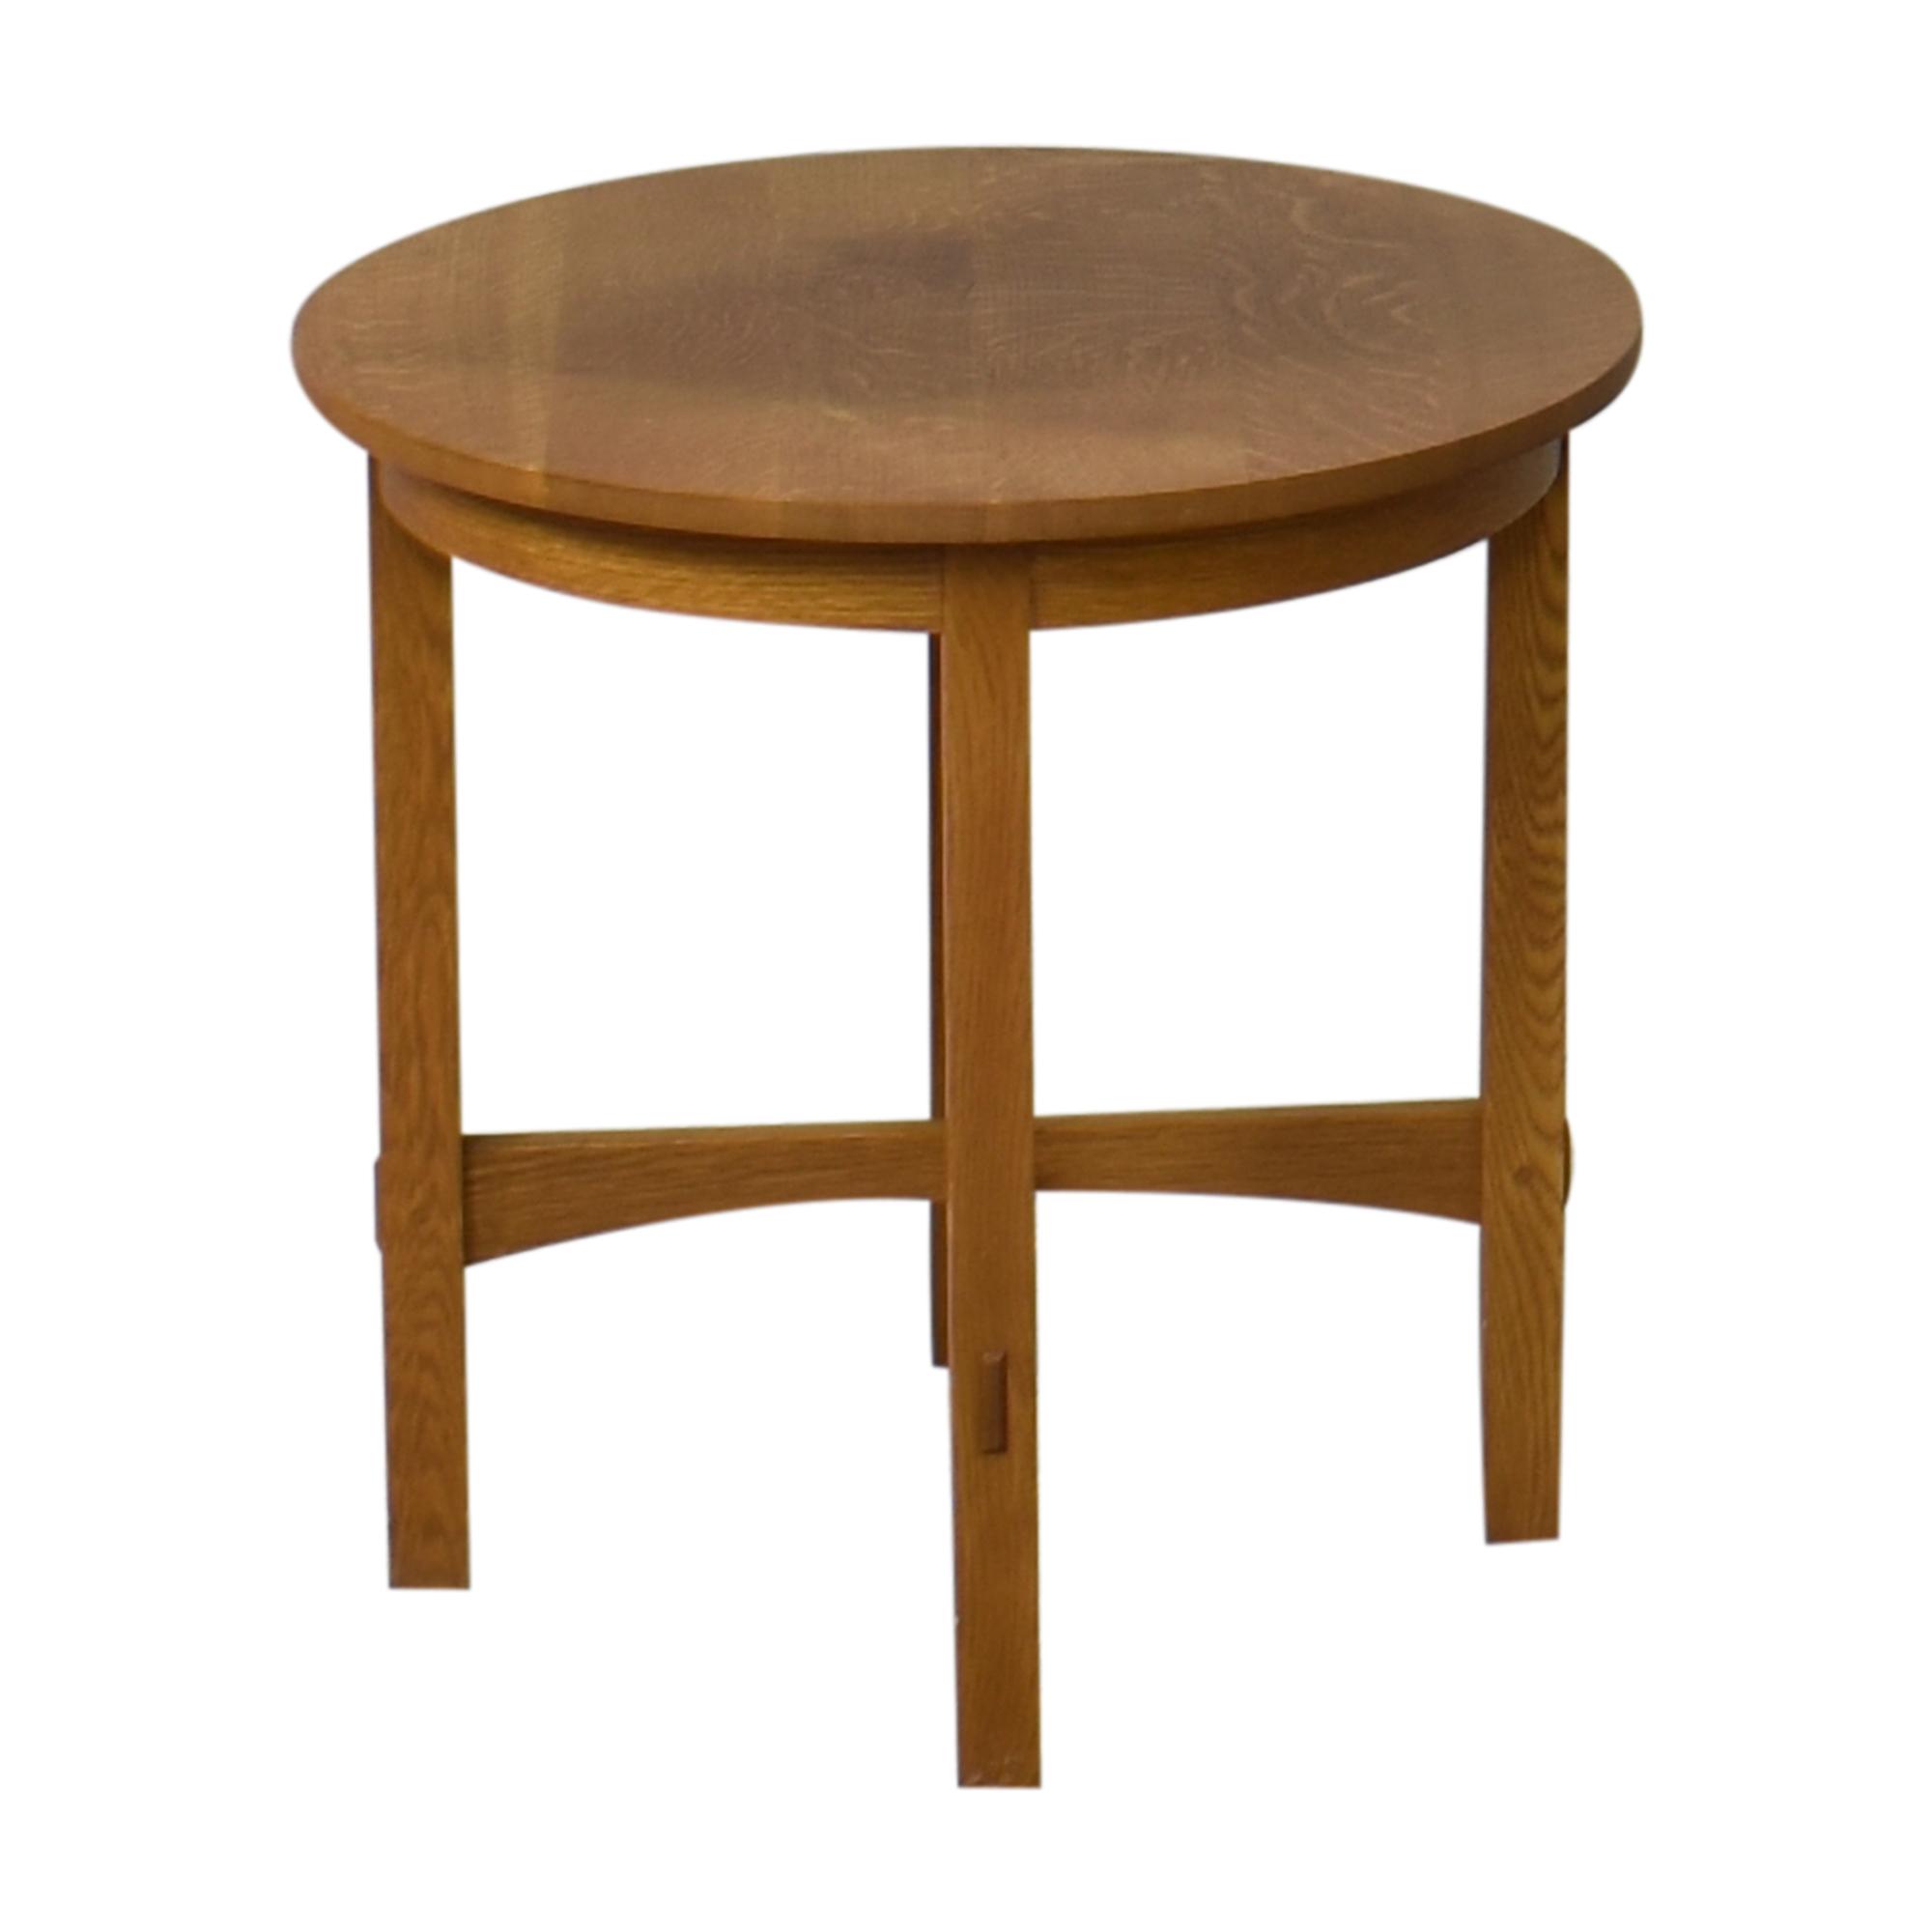 Stickley Furniture Stickley Furniture Round Side Table ma